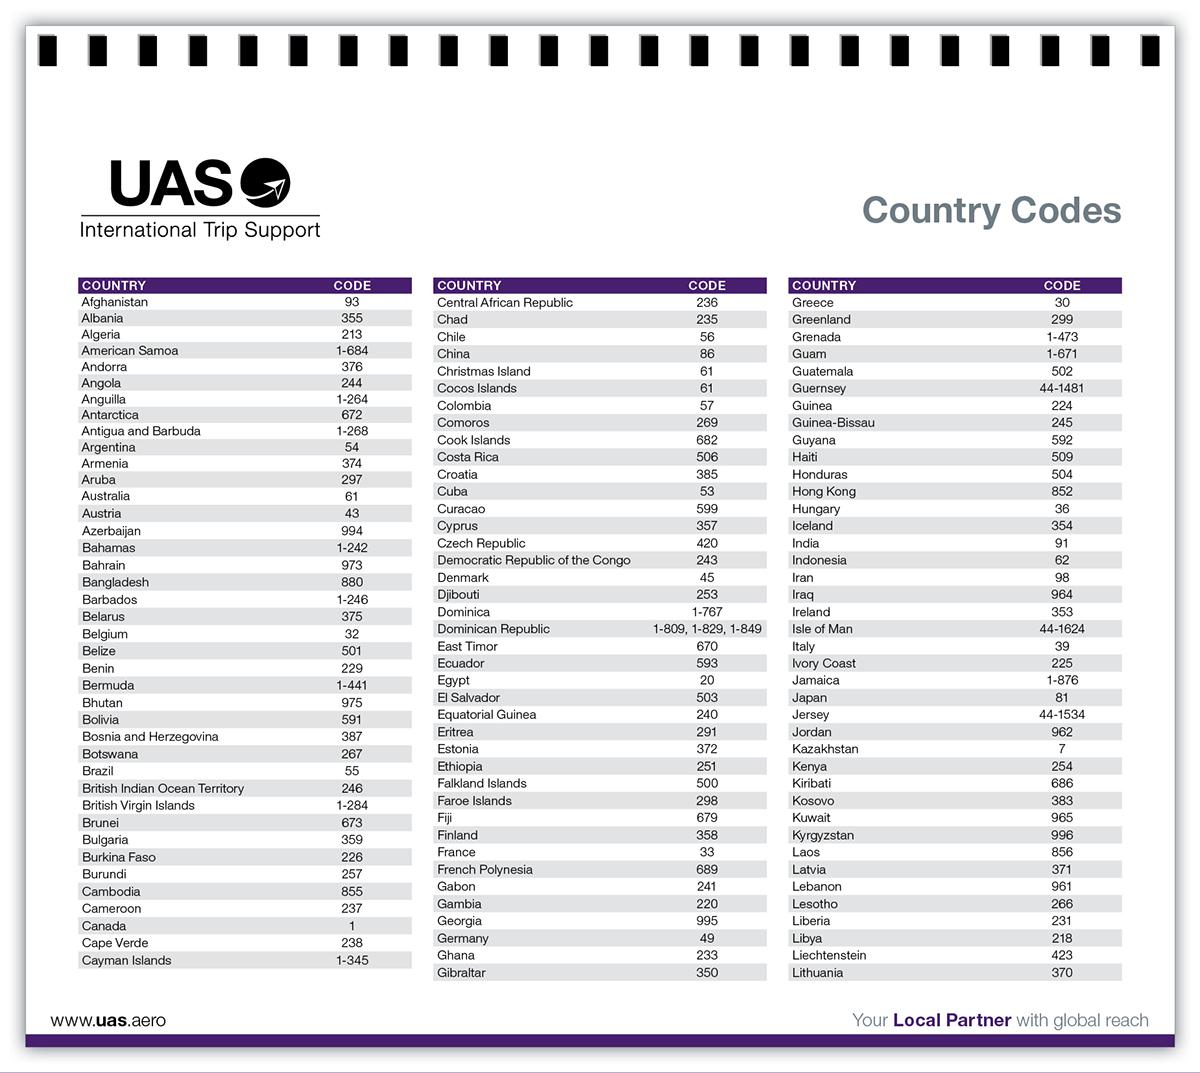 Calendar 2016 for UAS International Trip Support on Behance